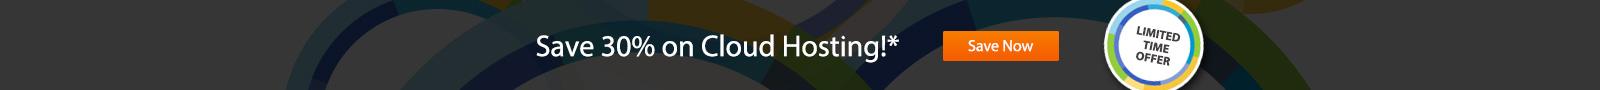 Save 30% on cloud hosting!